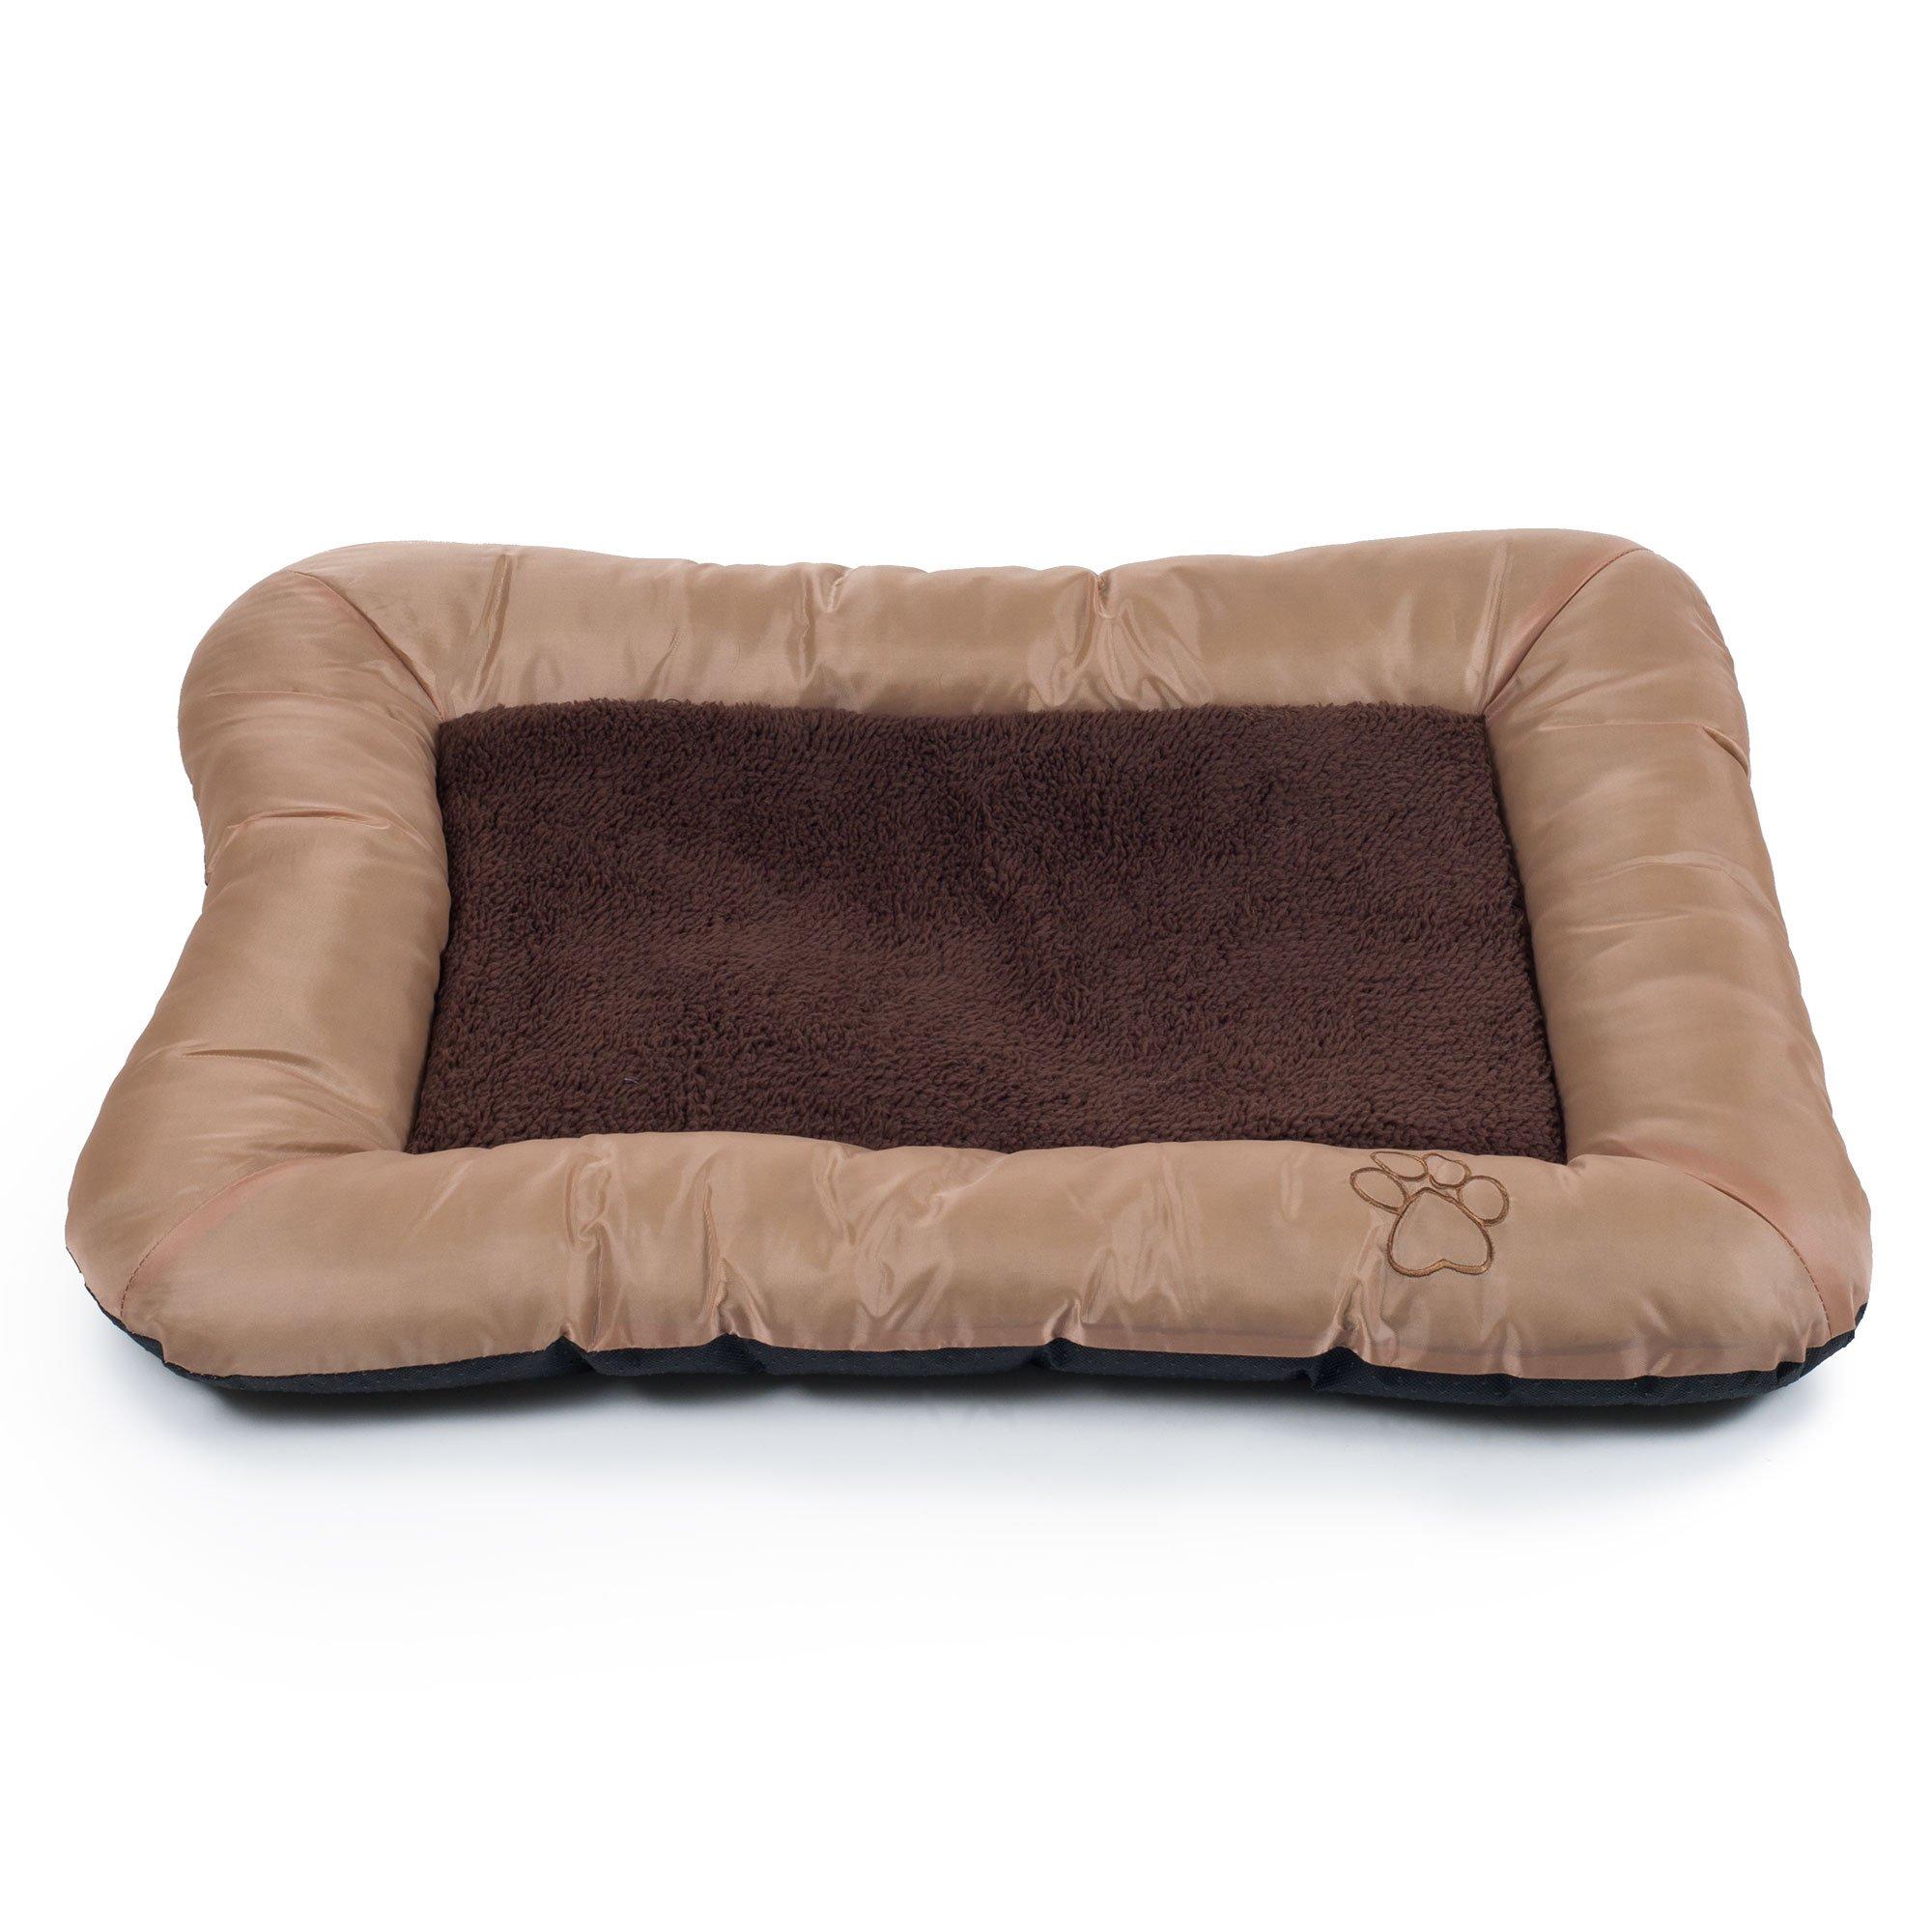 PETMAKER Plush Cozy Pet Crate/Pet Bed, Large, Tan